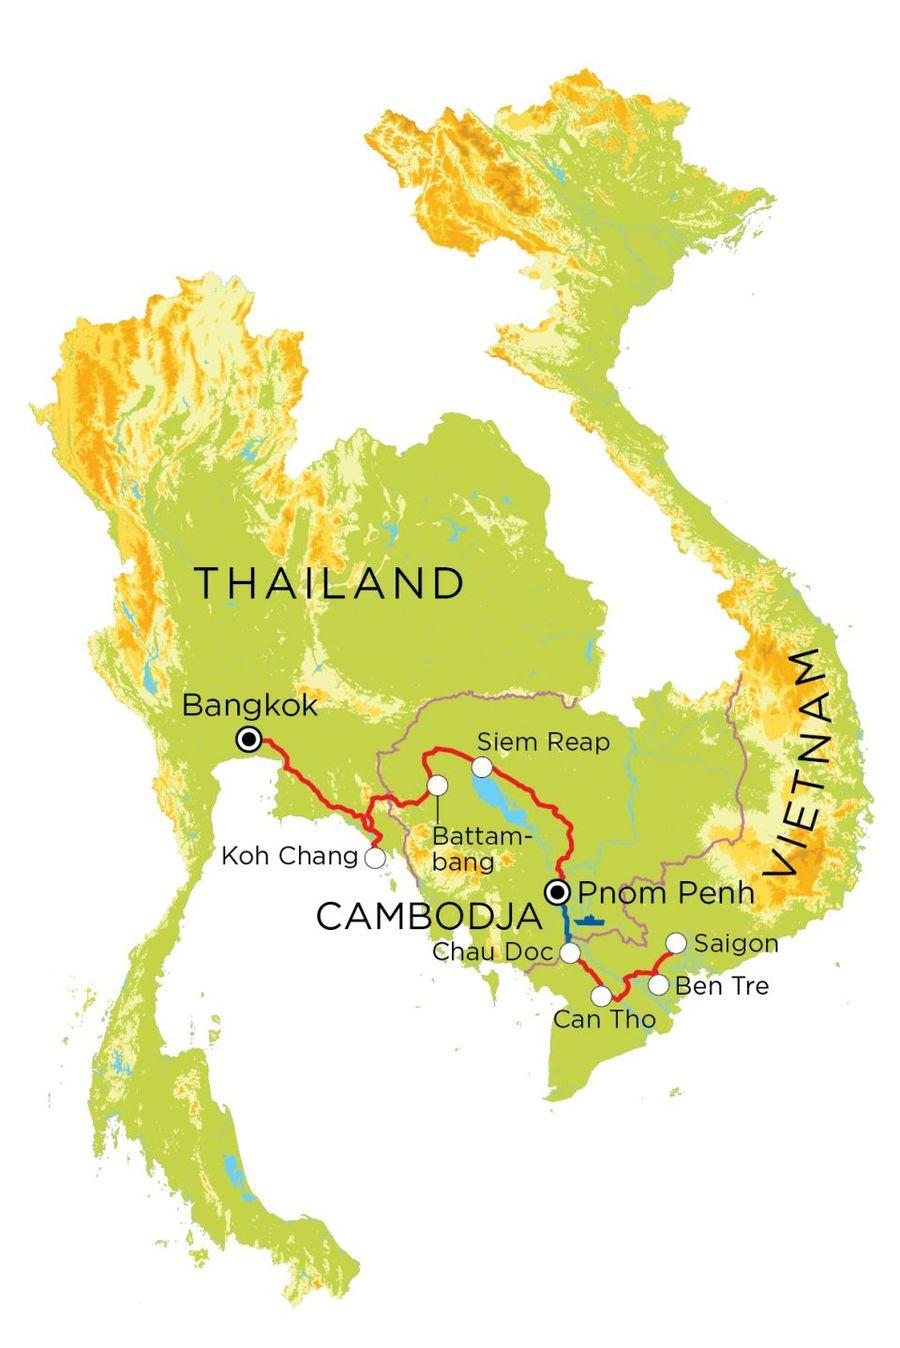 Routekaart Vietnam, Cambodja & Thailand, 21 dagen